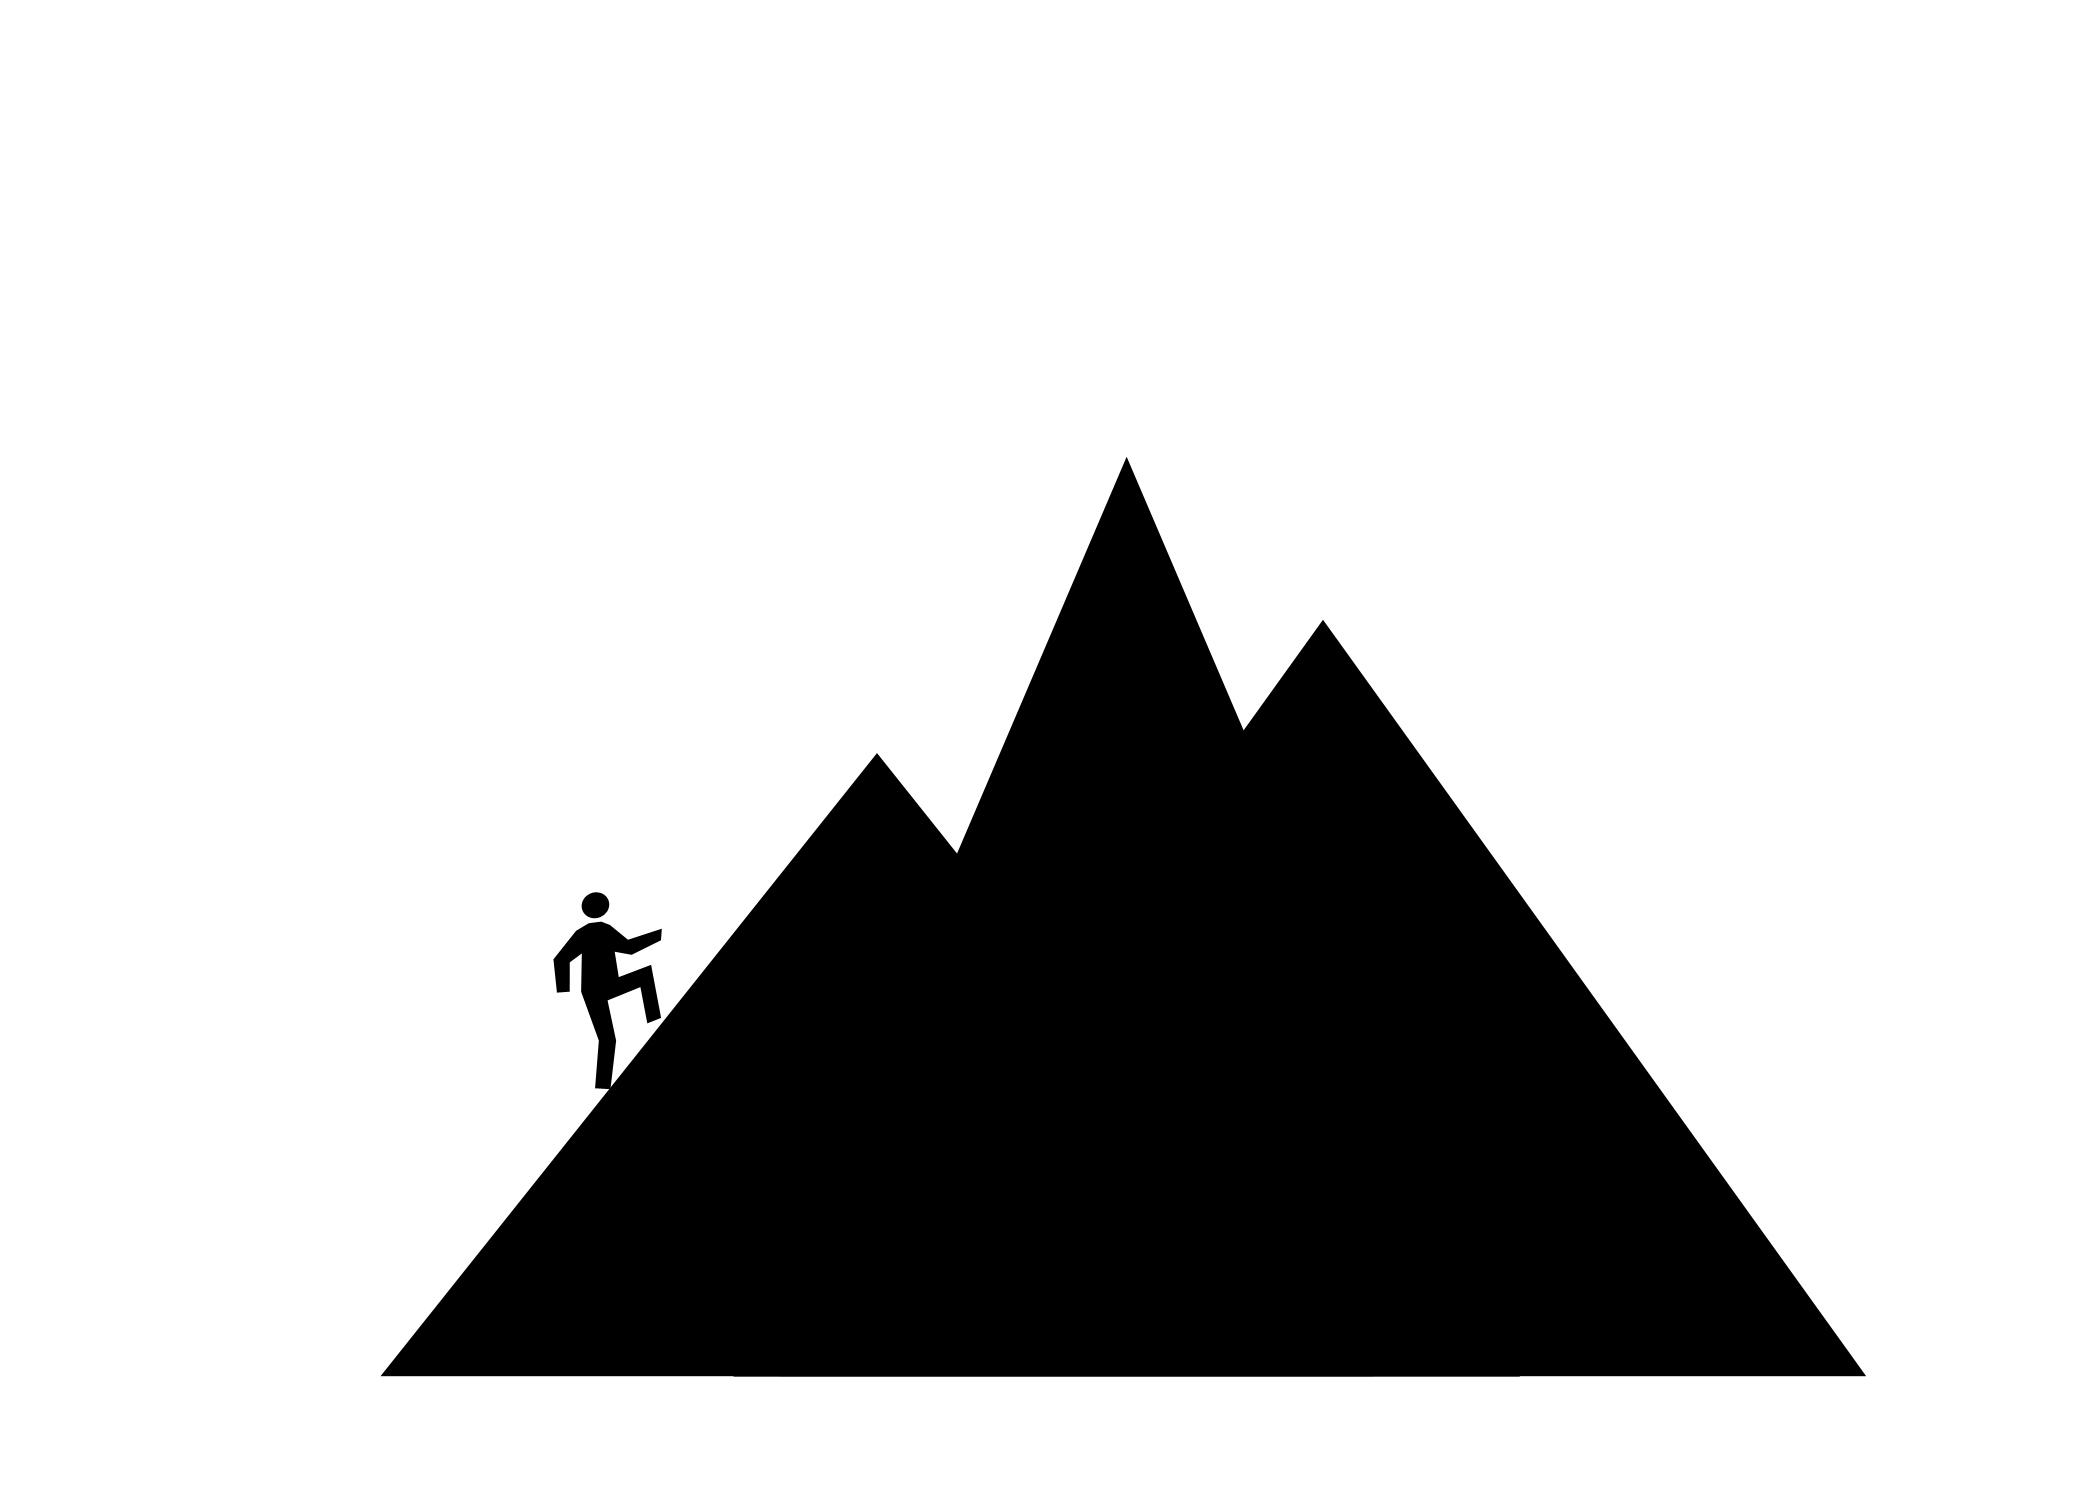 2100x1500 Mountain Climbing Silhouette Clipart Free